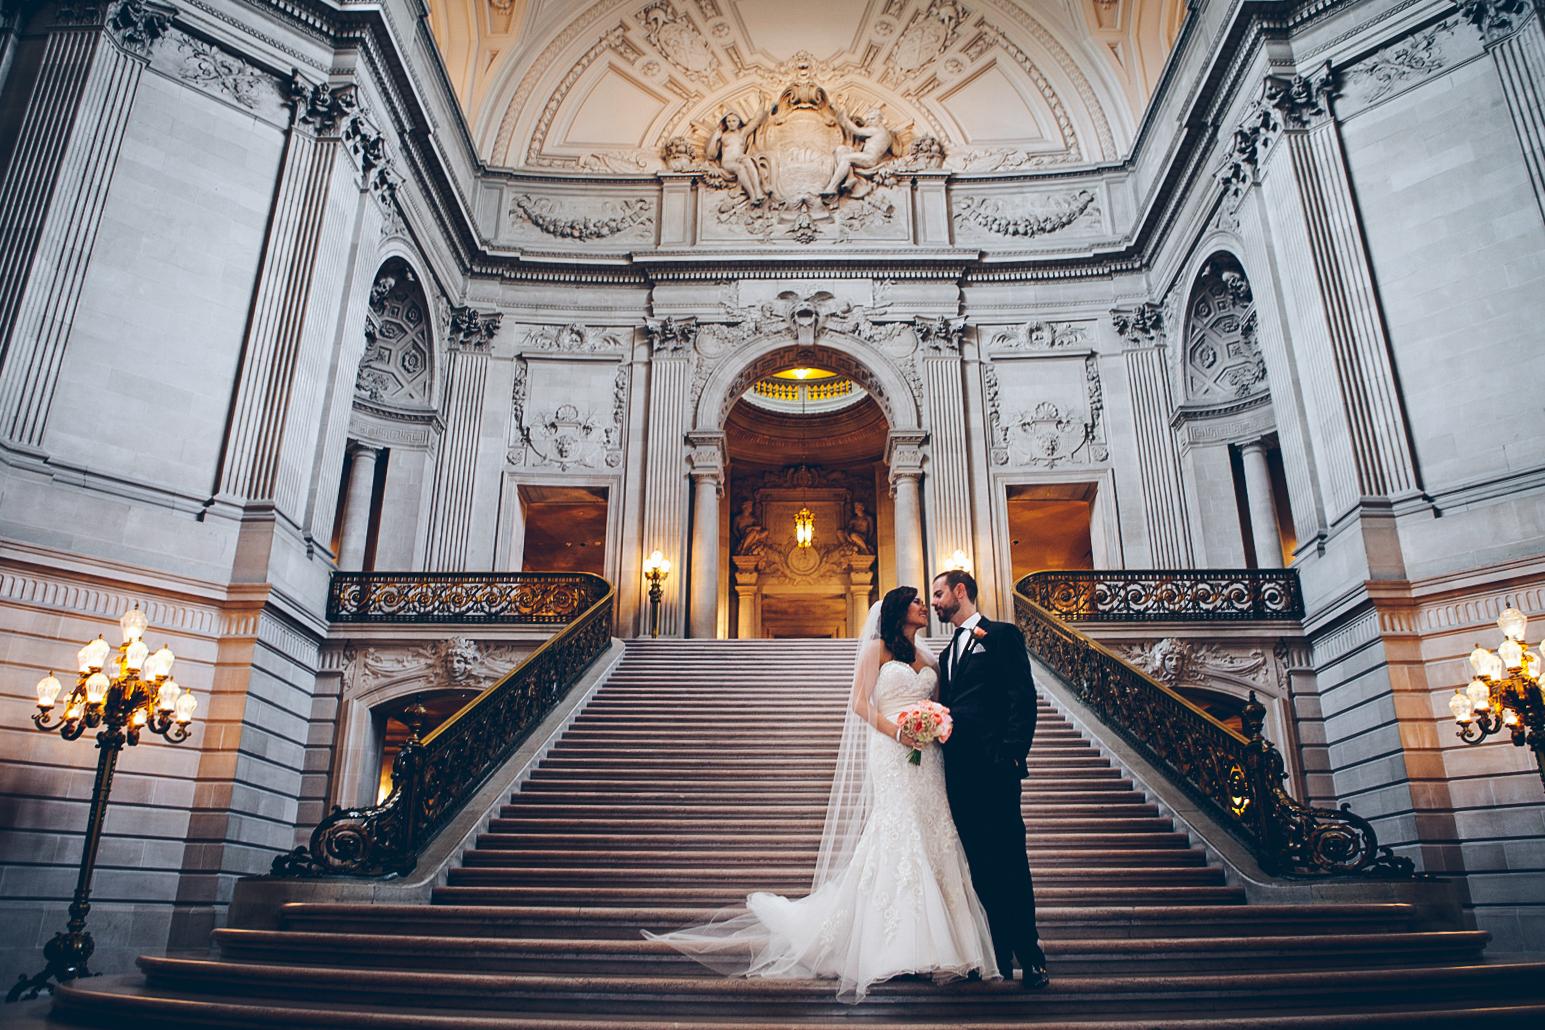 San_francisco_city_hall_wedding_photography_meegan_travis_ebony_siovhan_bokeh_photography_53.jpg